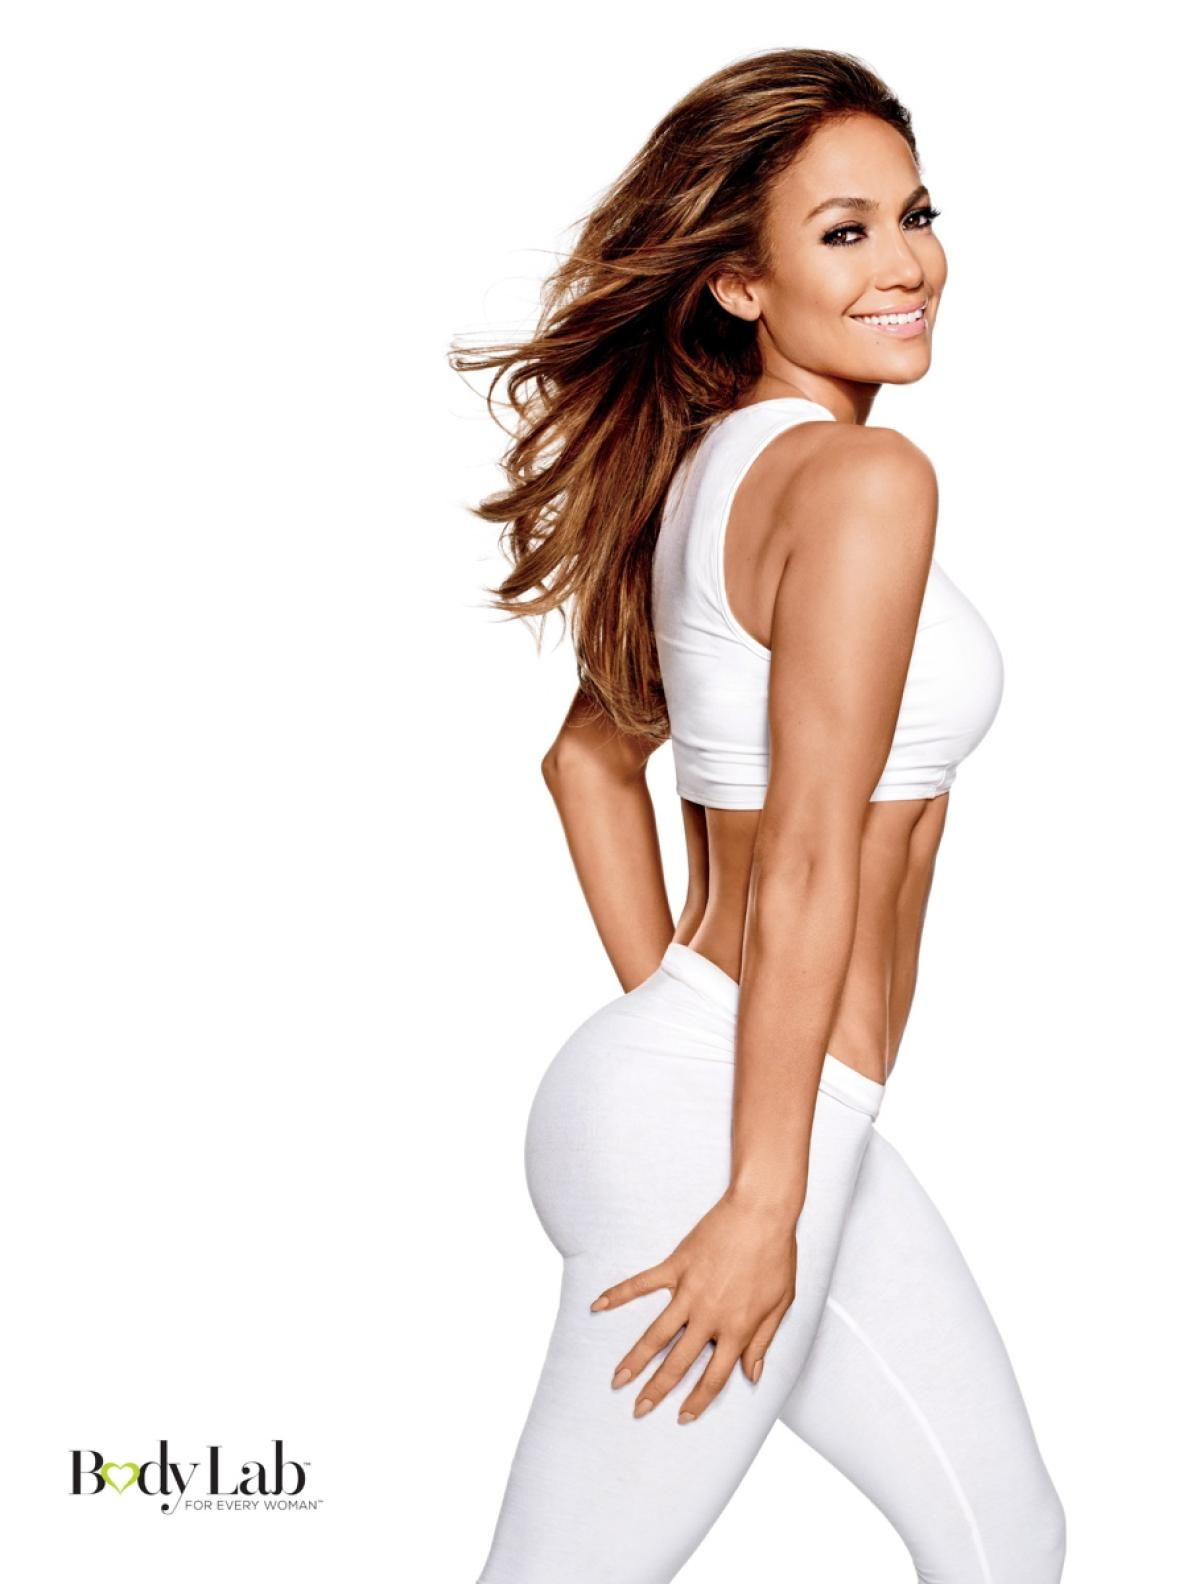 54c282297d3f1 Jennifer Lopez at the Latin Billboard Awards - Photos - Jennifer ...